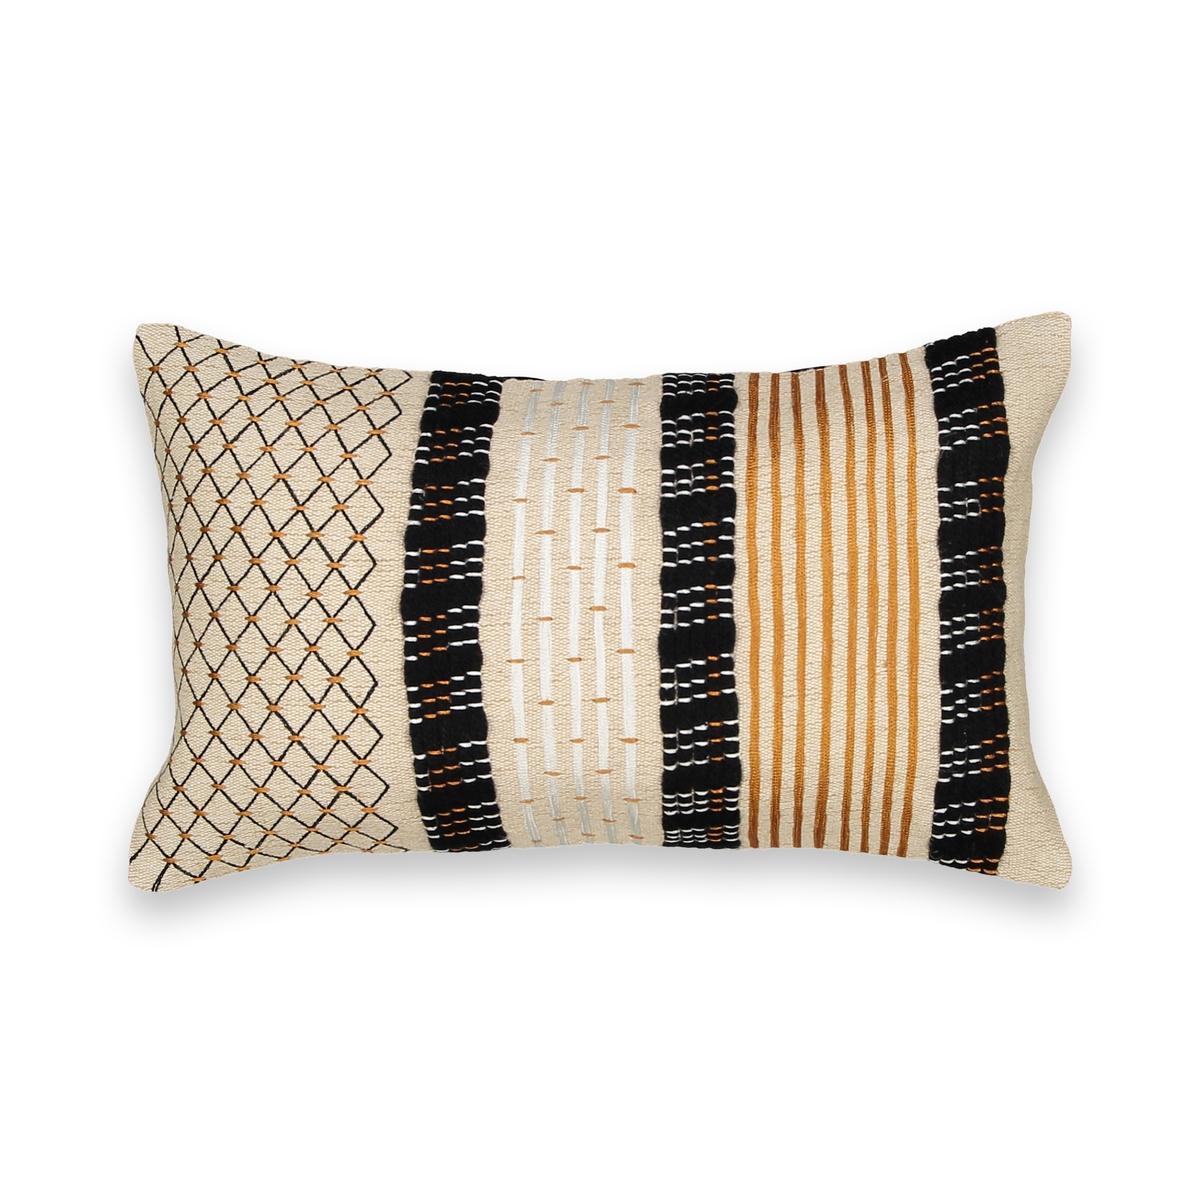 Чехол на подушку-валик с вышивкой, Luzubal цена